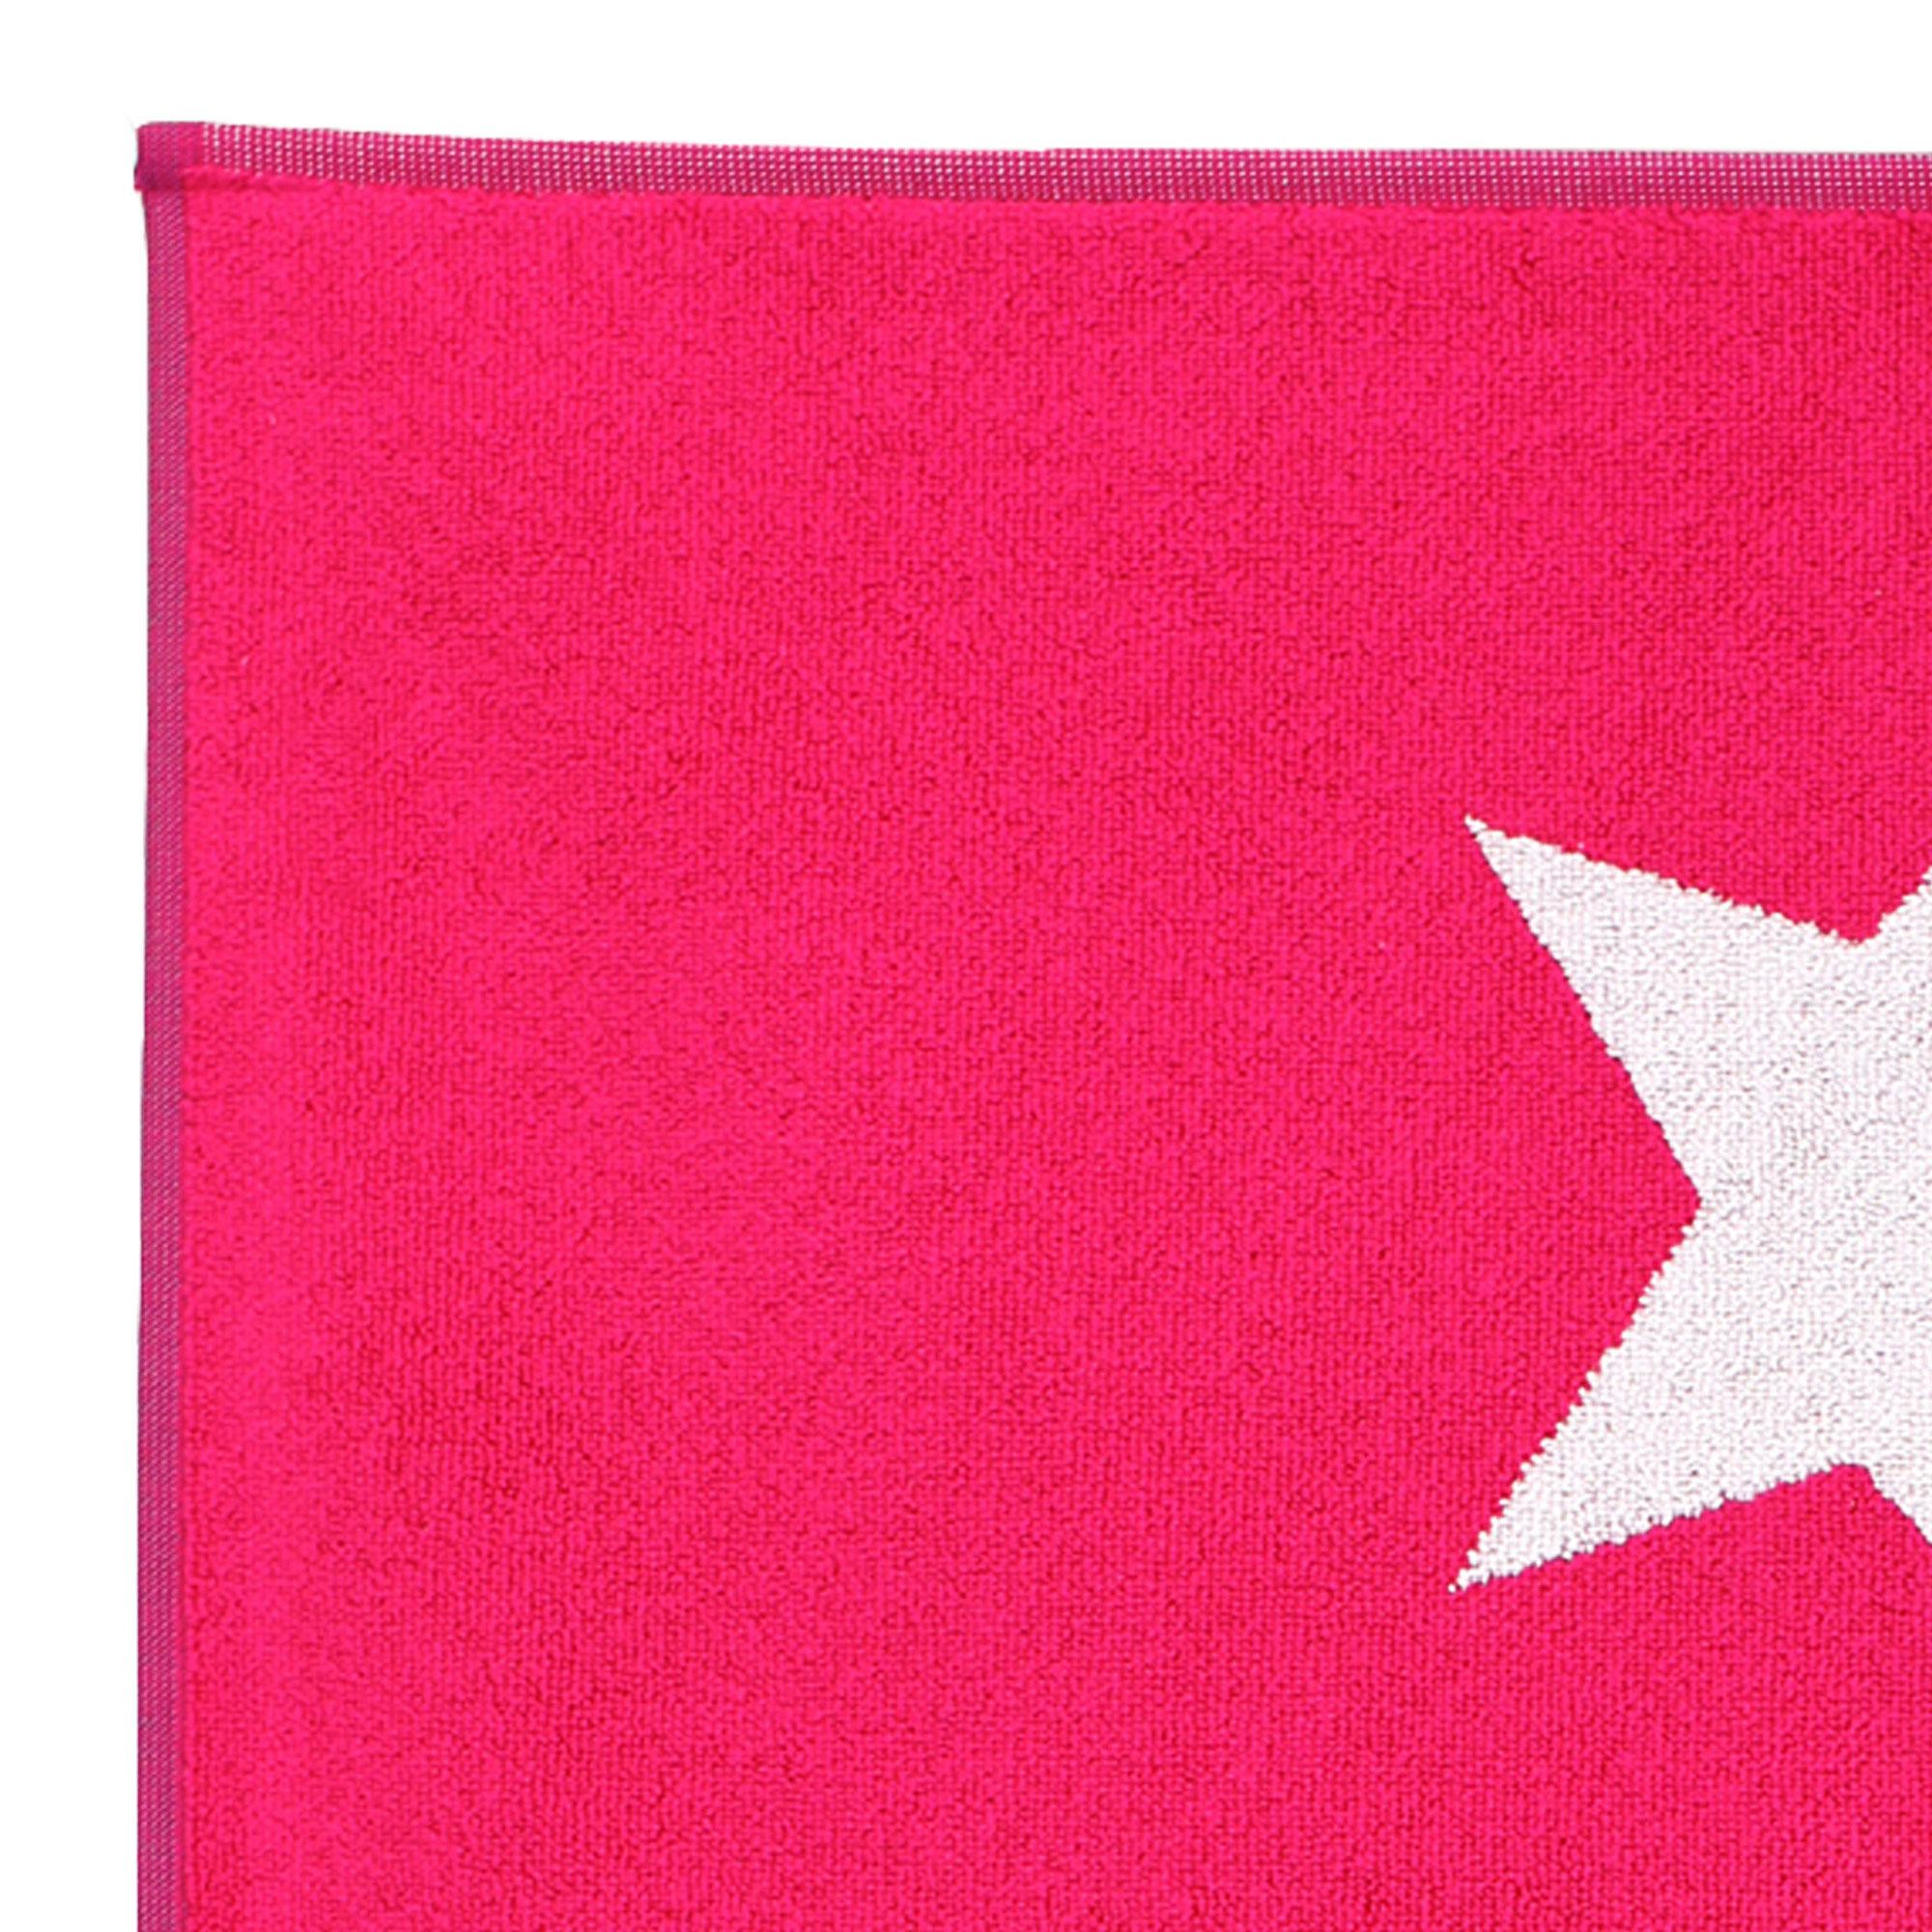 tapis de bain 50x70 100 coton 700g m2 stars rose ebay. Black Bedroom Furniture Sets. Home Design Ideas